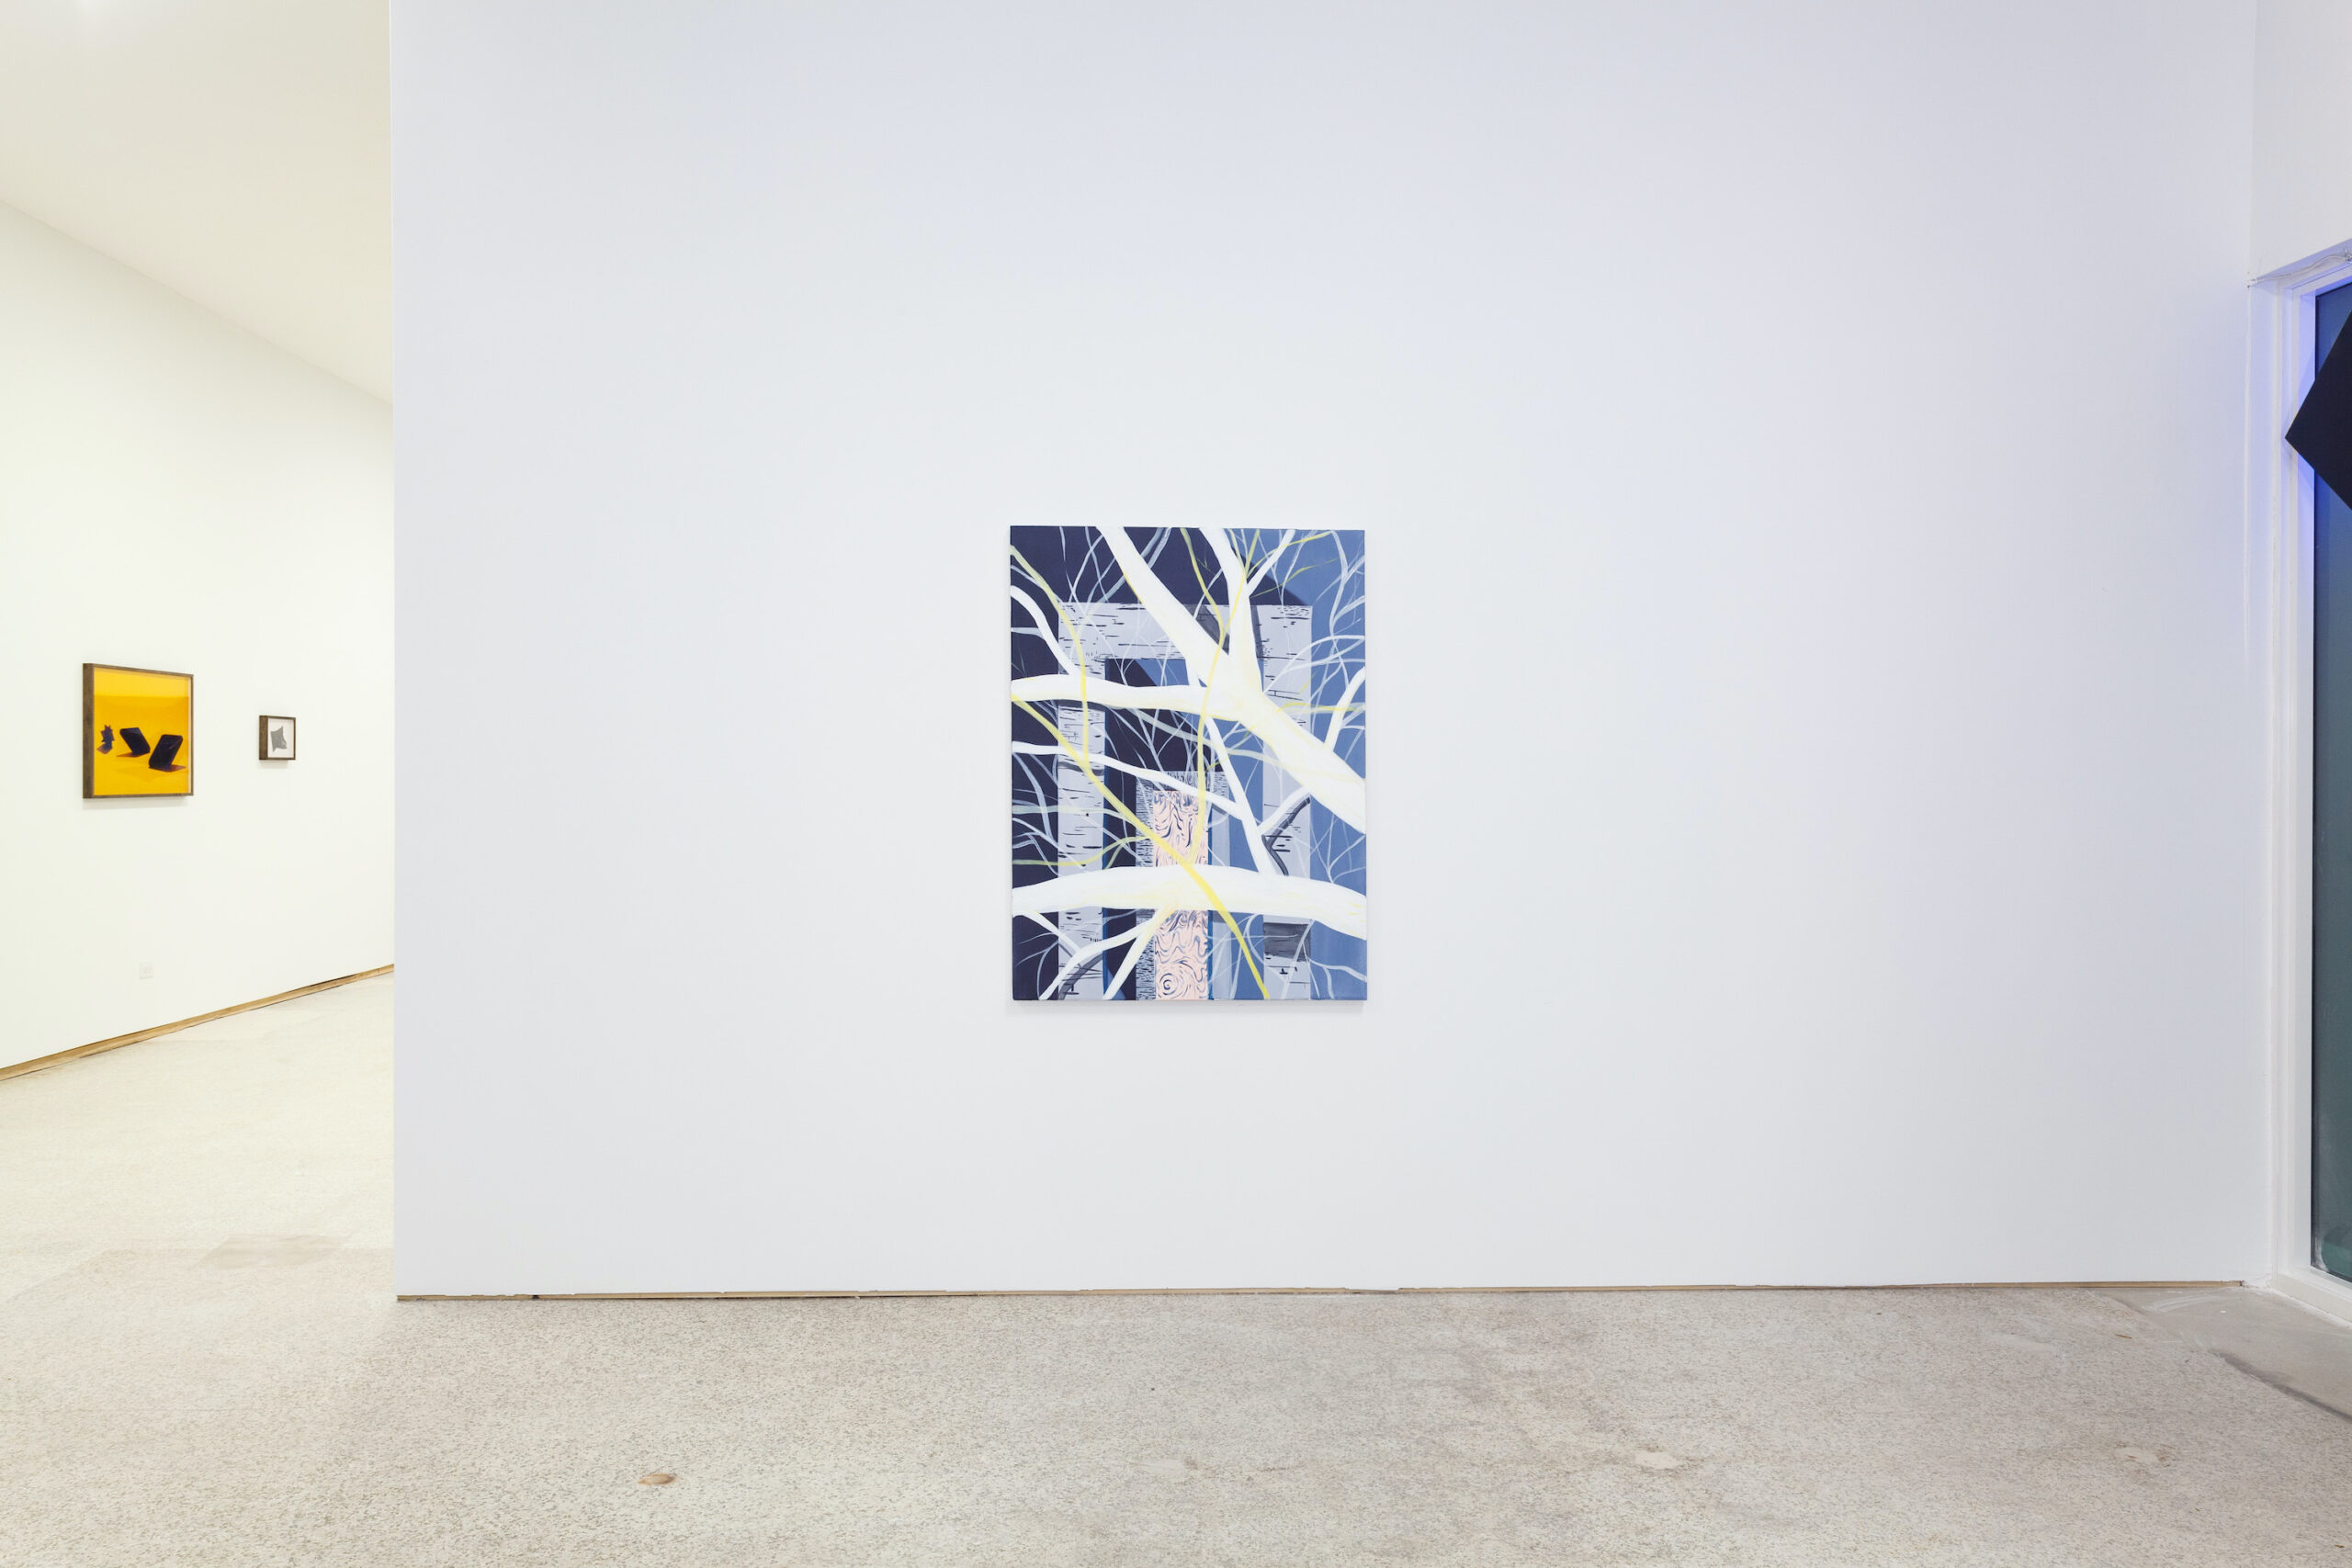 Ernesto Gutiérrez Moya, Untitled, 2020, Oil on canvas, 48 x 36 inches